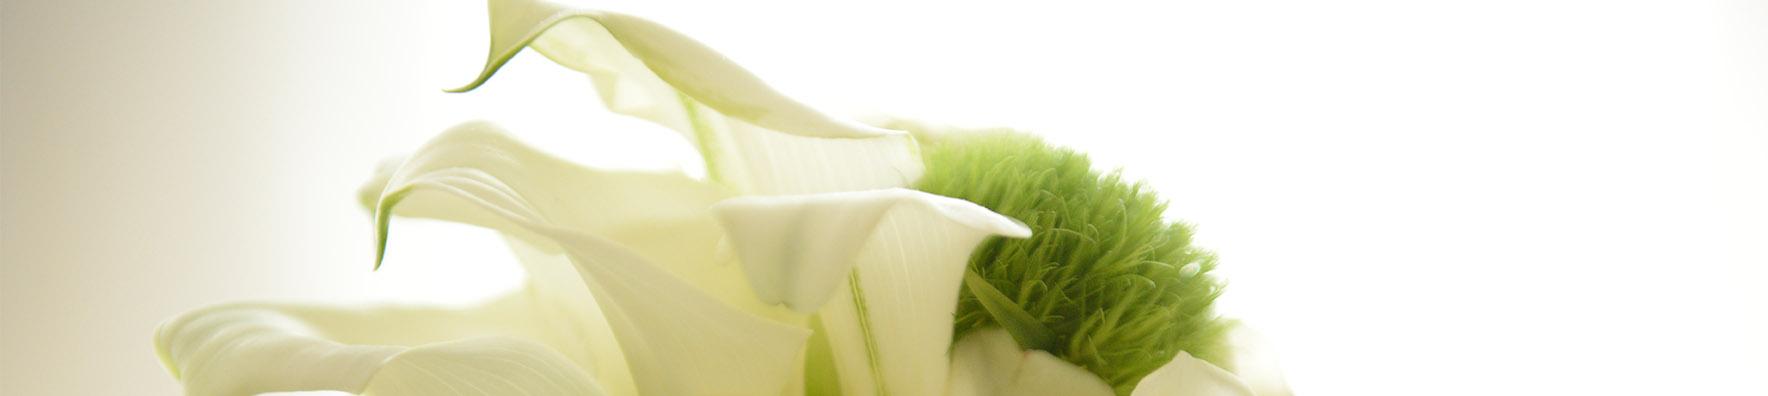 Blumenkunst - Blumenladen Ergolding